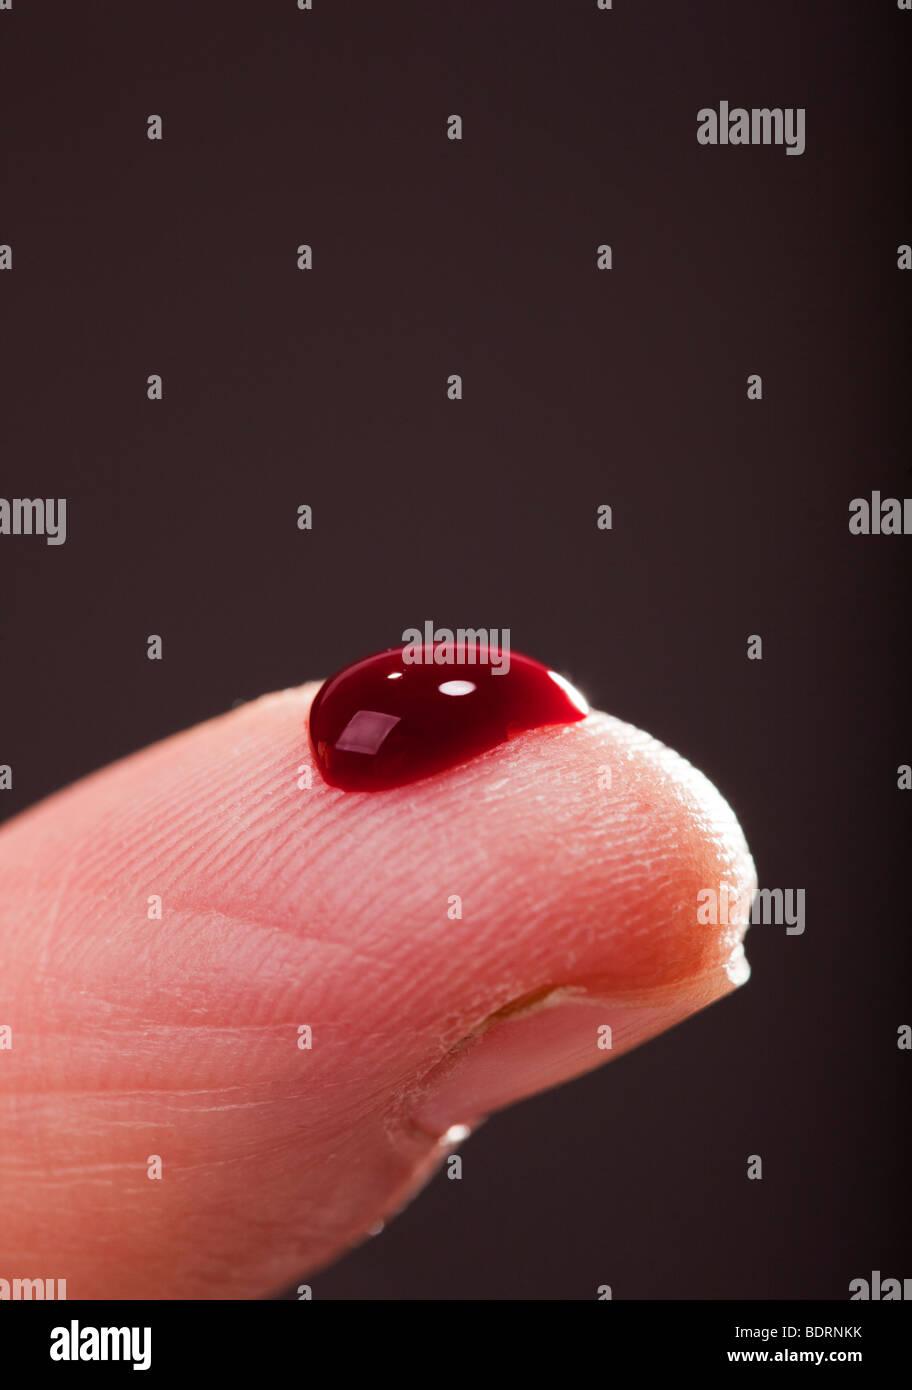 Fingerspitze mit Tropfen Blut. Stockbild